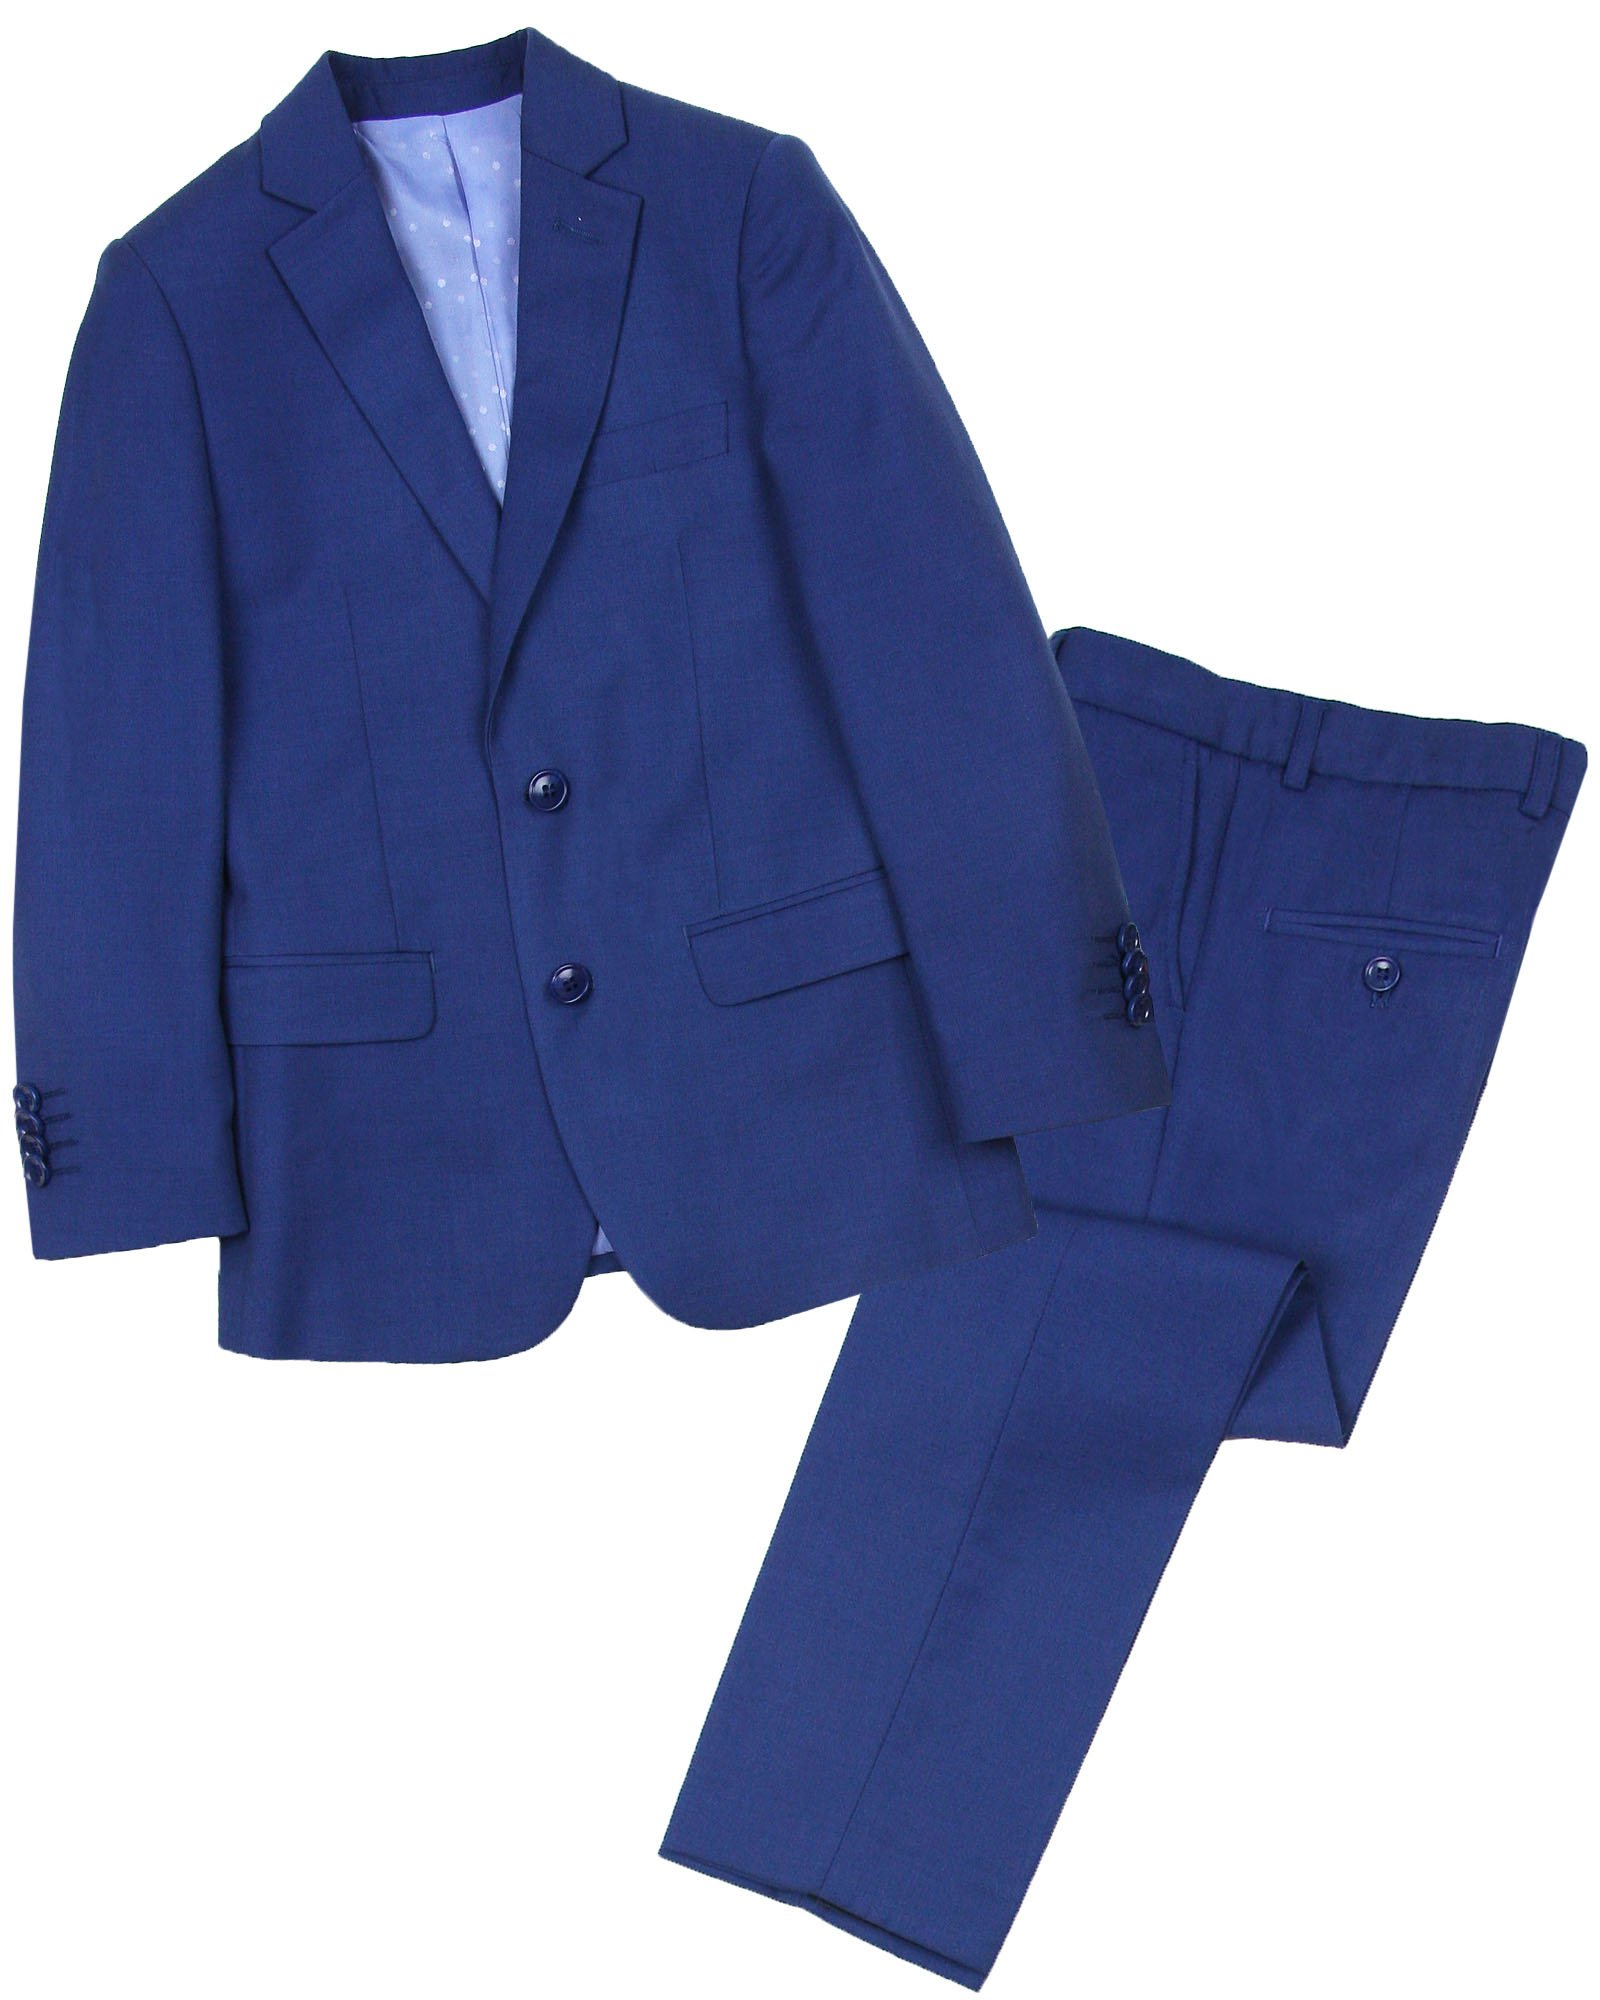 Isaac Mizrahi Boys' Two-Piece Wool Blend Suit, Sizes 4-16 - 4